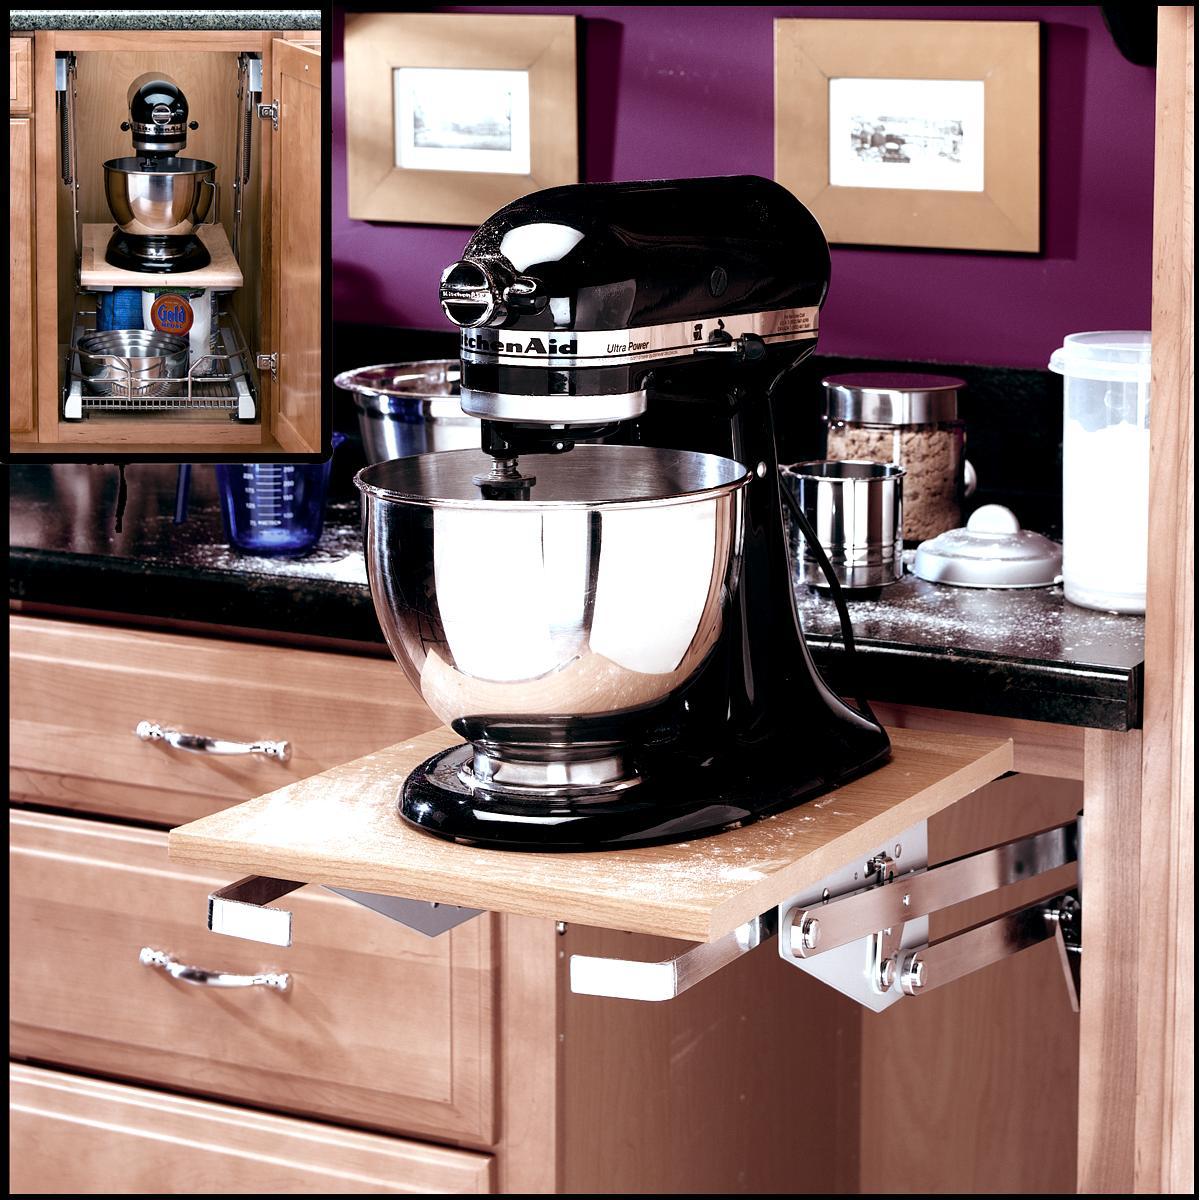 Heavy Duty Mixer Lift Or Appliance Lift, RAS-ML-HDCR